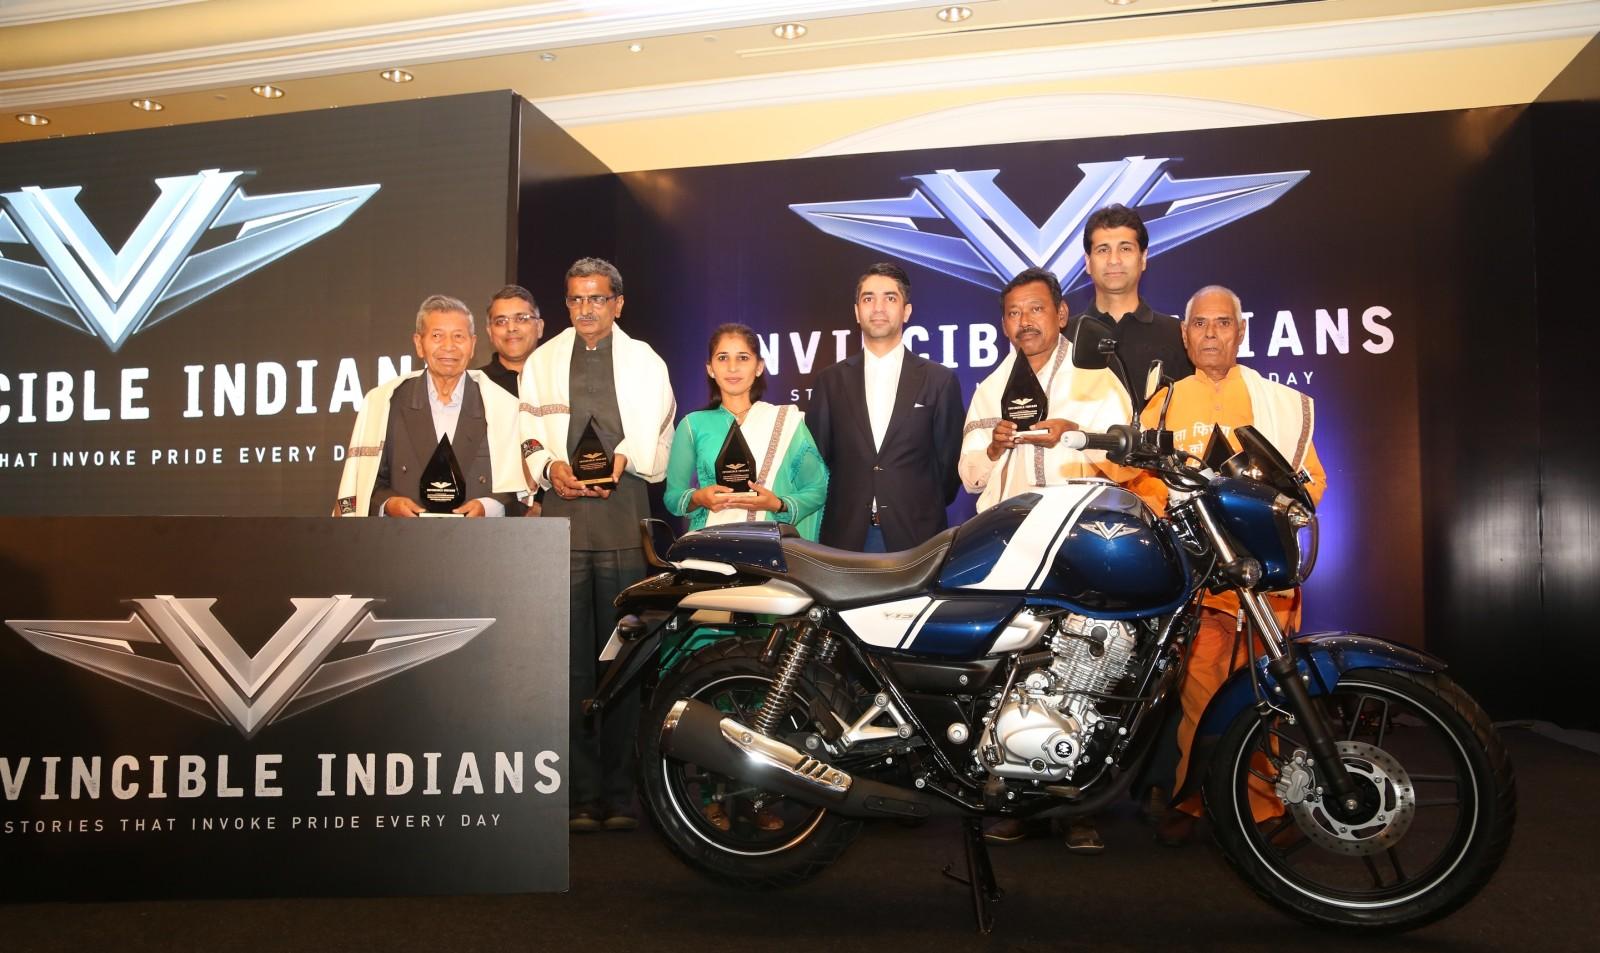 bajaj-v-launches-invincible-indians-2